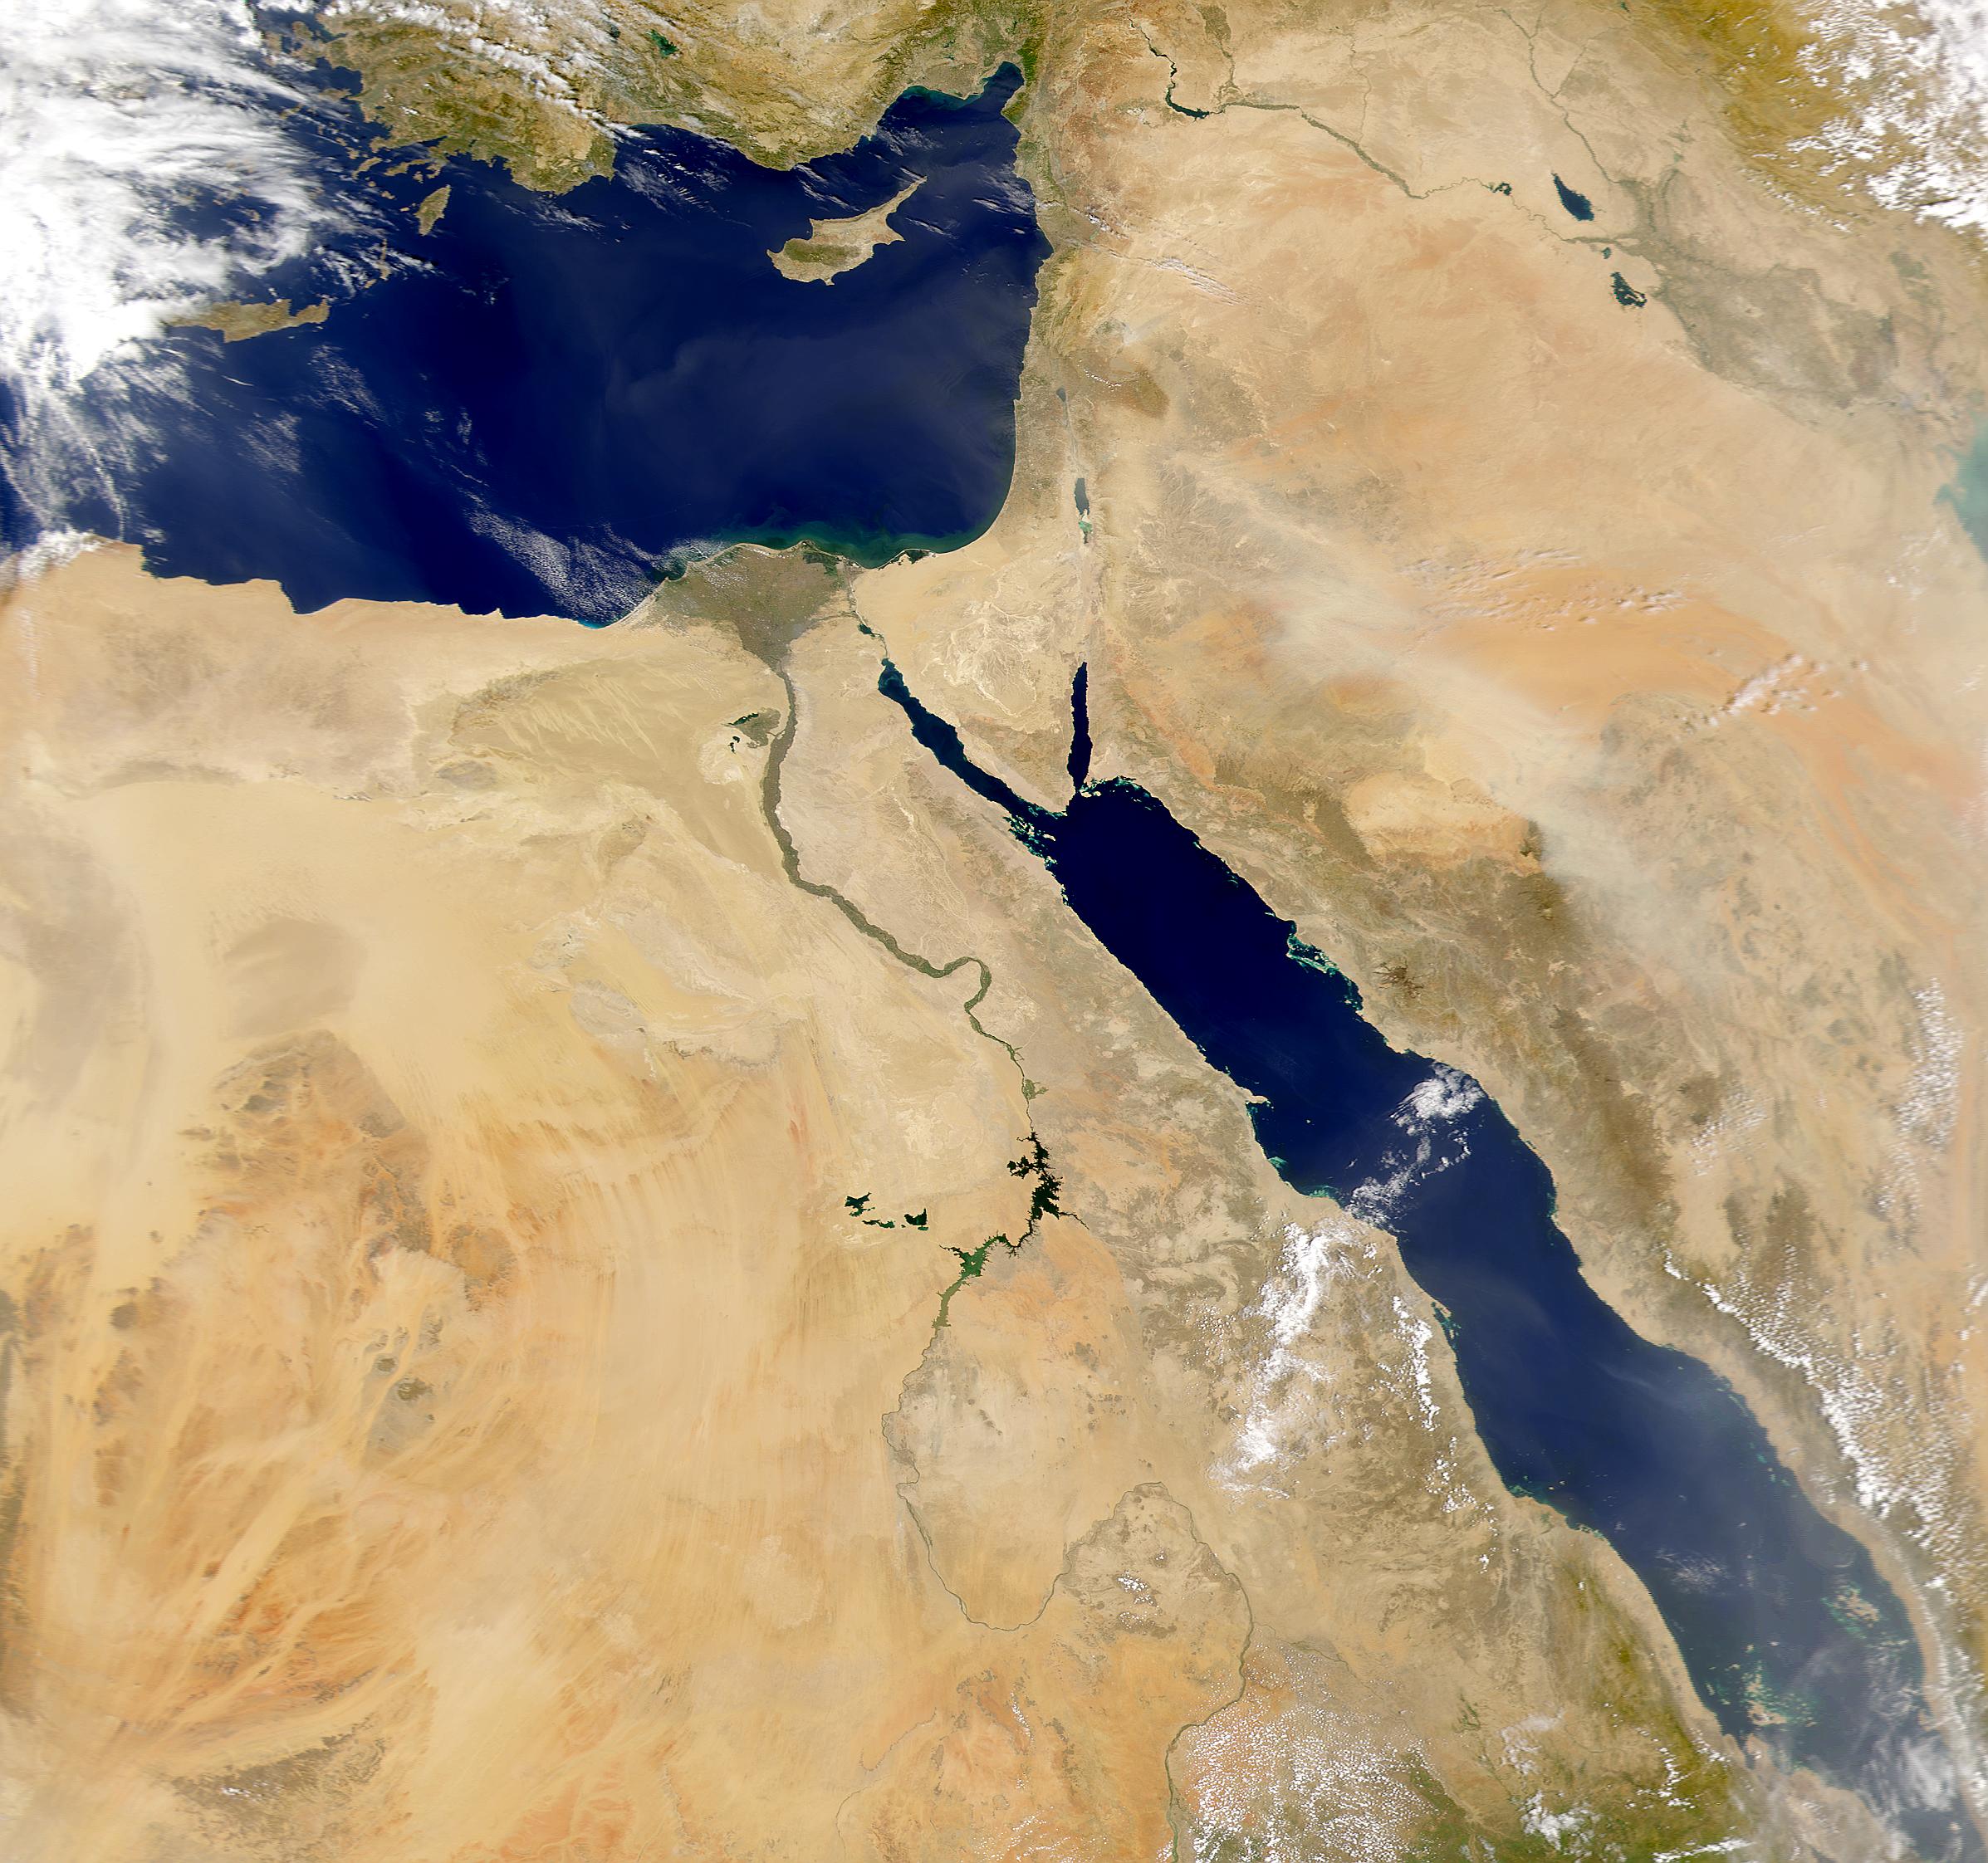 Nile River and Saudi Dust Storm